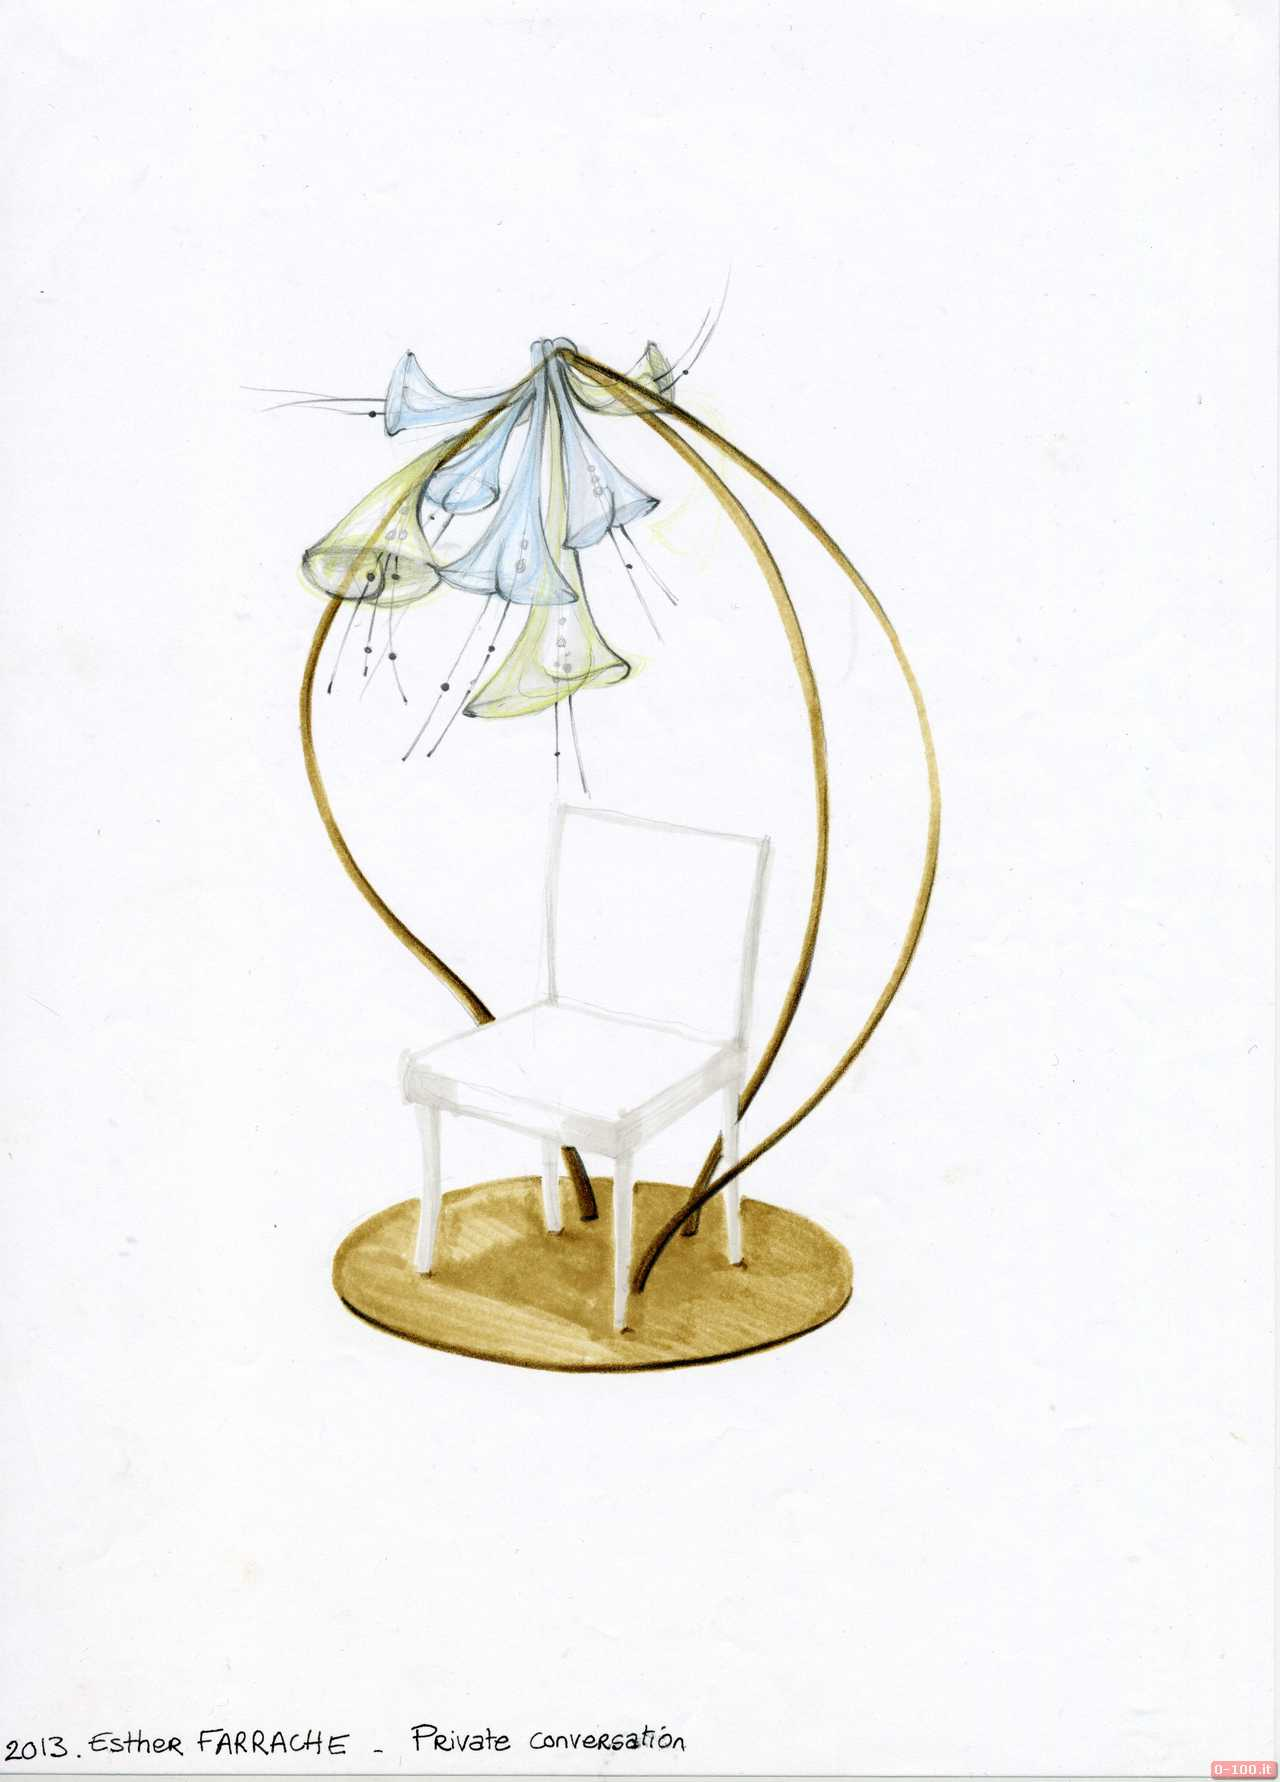 Blooming Creativity_Private Conversation - Esther Farrache _Van Cleef & Arpels_0-100 4